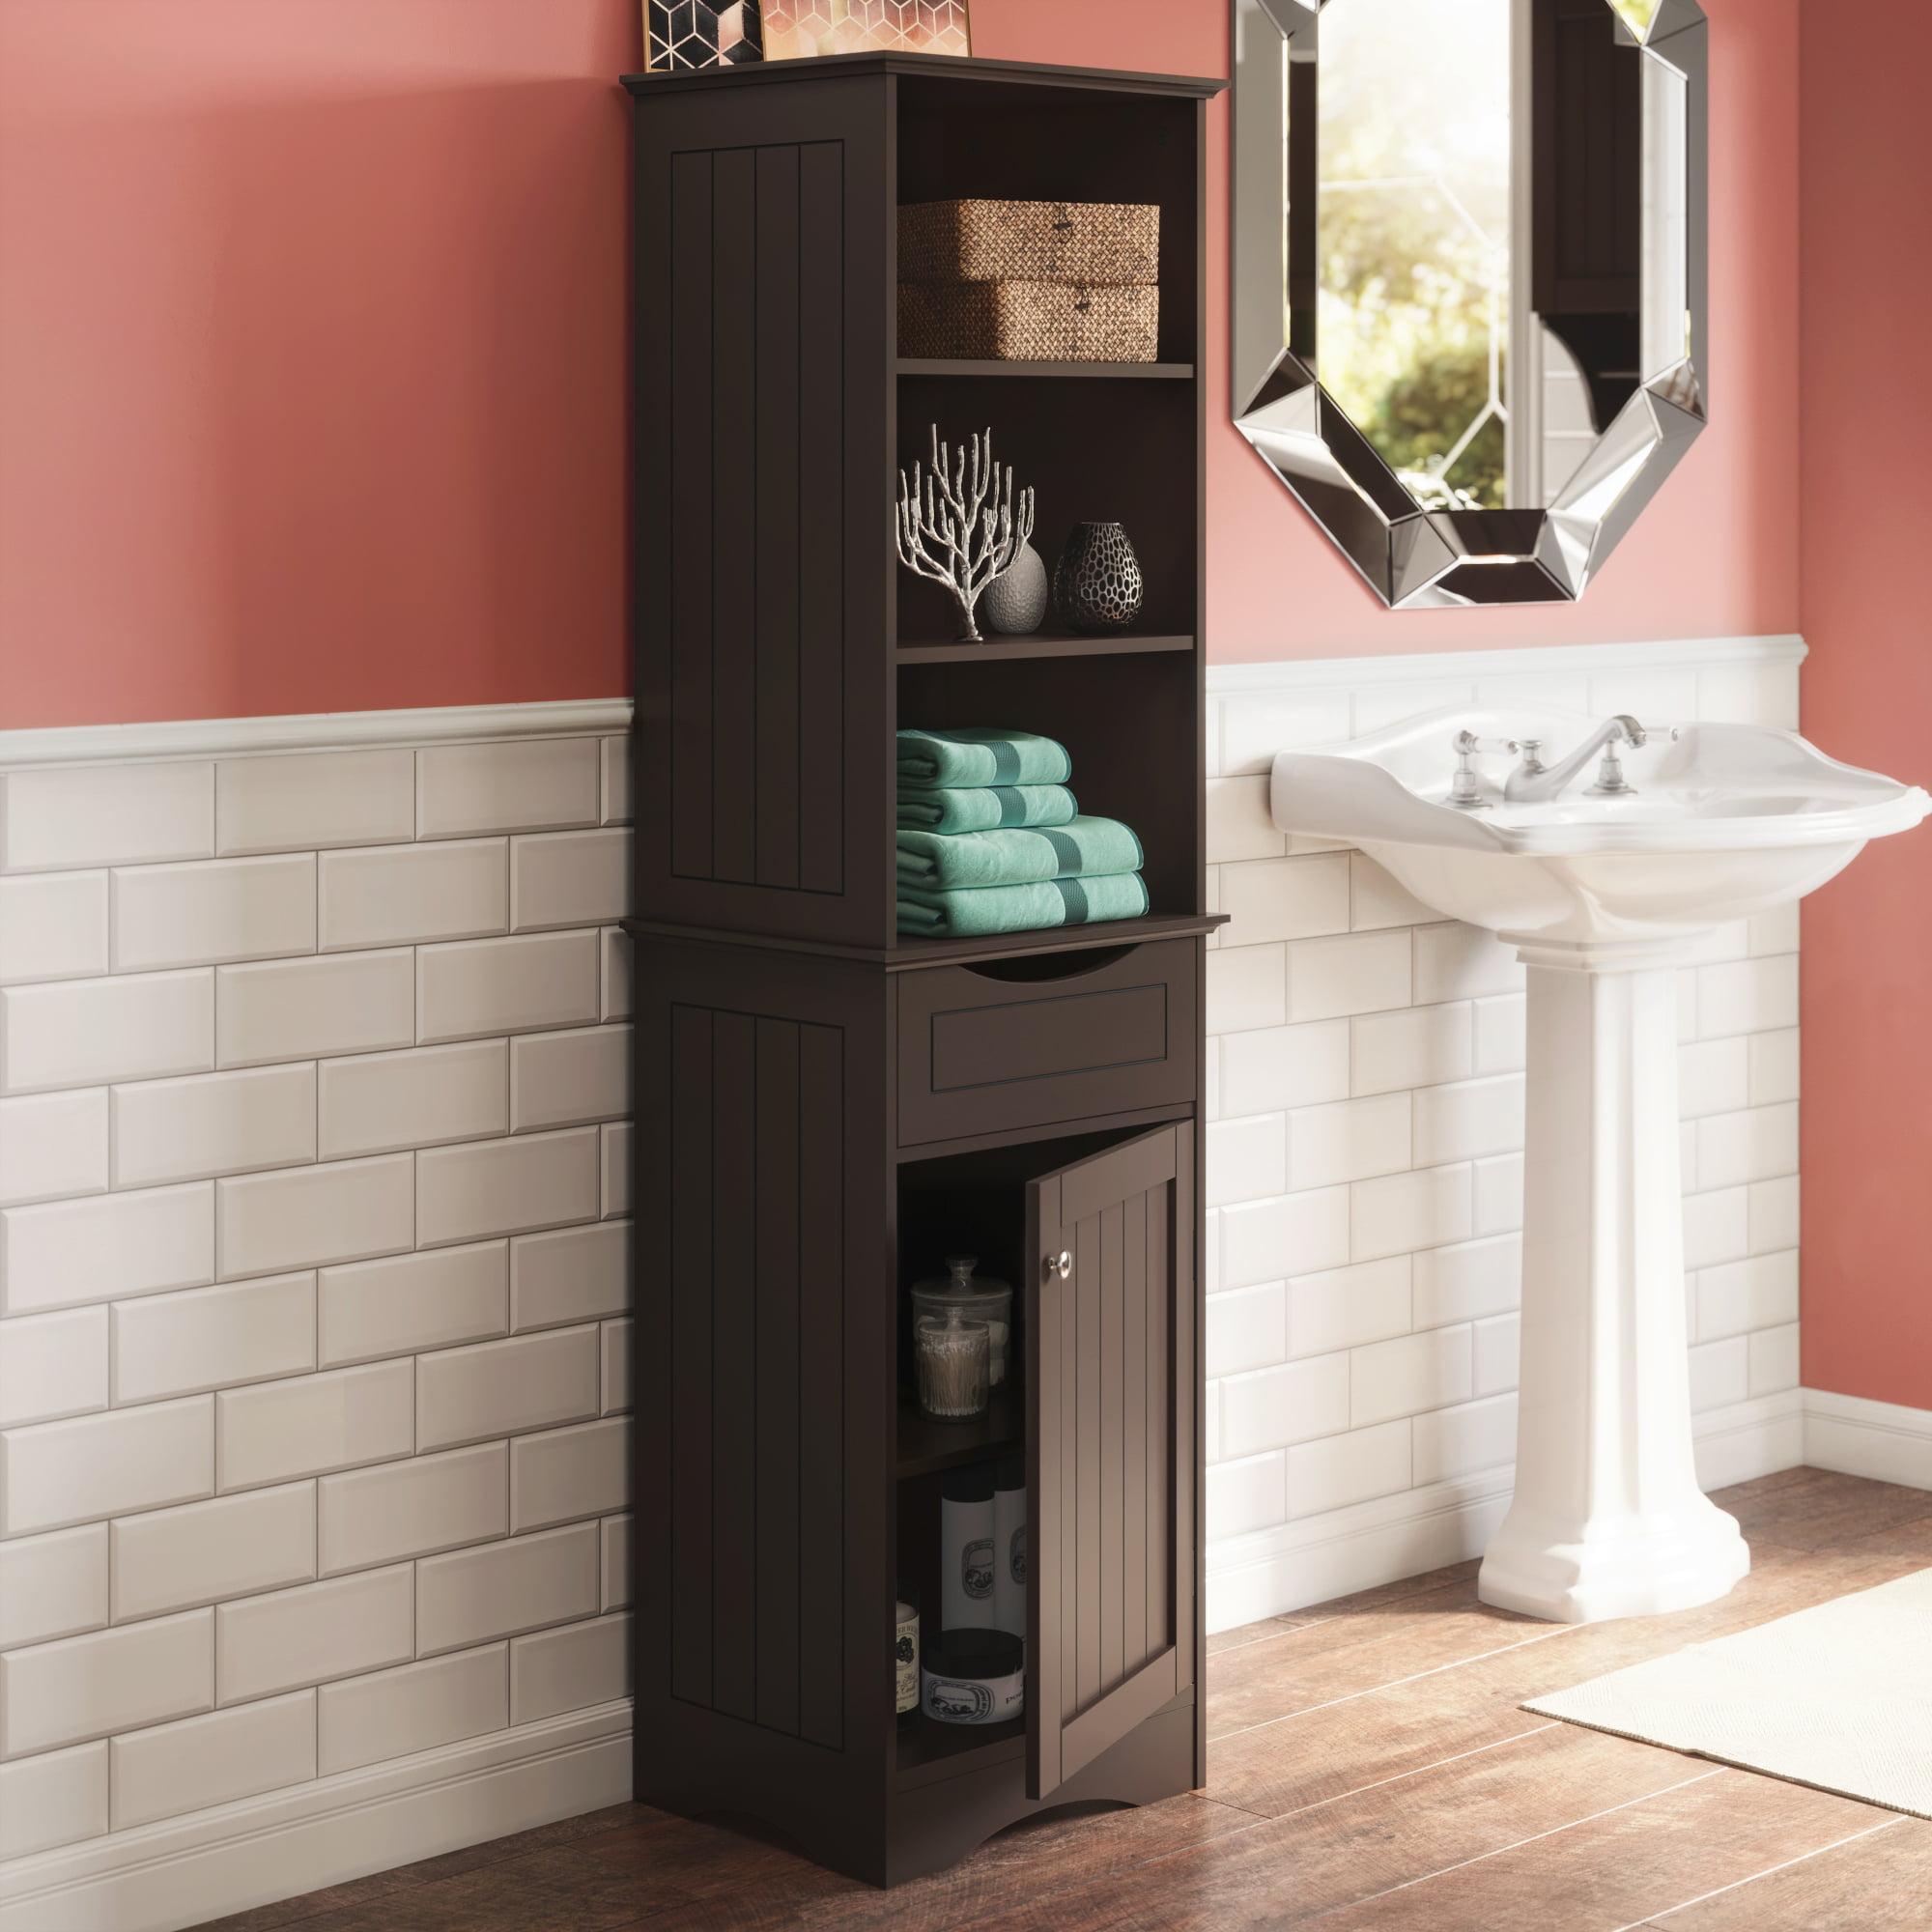 Ashland Collection Tall Linen Cabinet Bathroom Storage Espresso Walmart Com Walmart Com